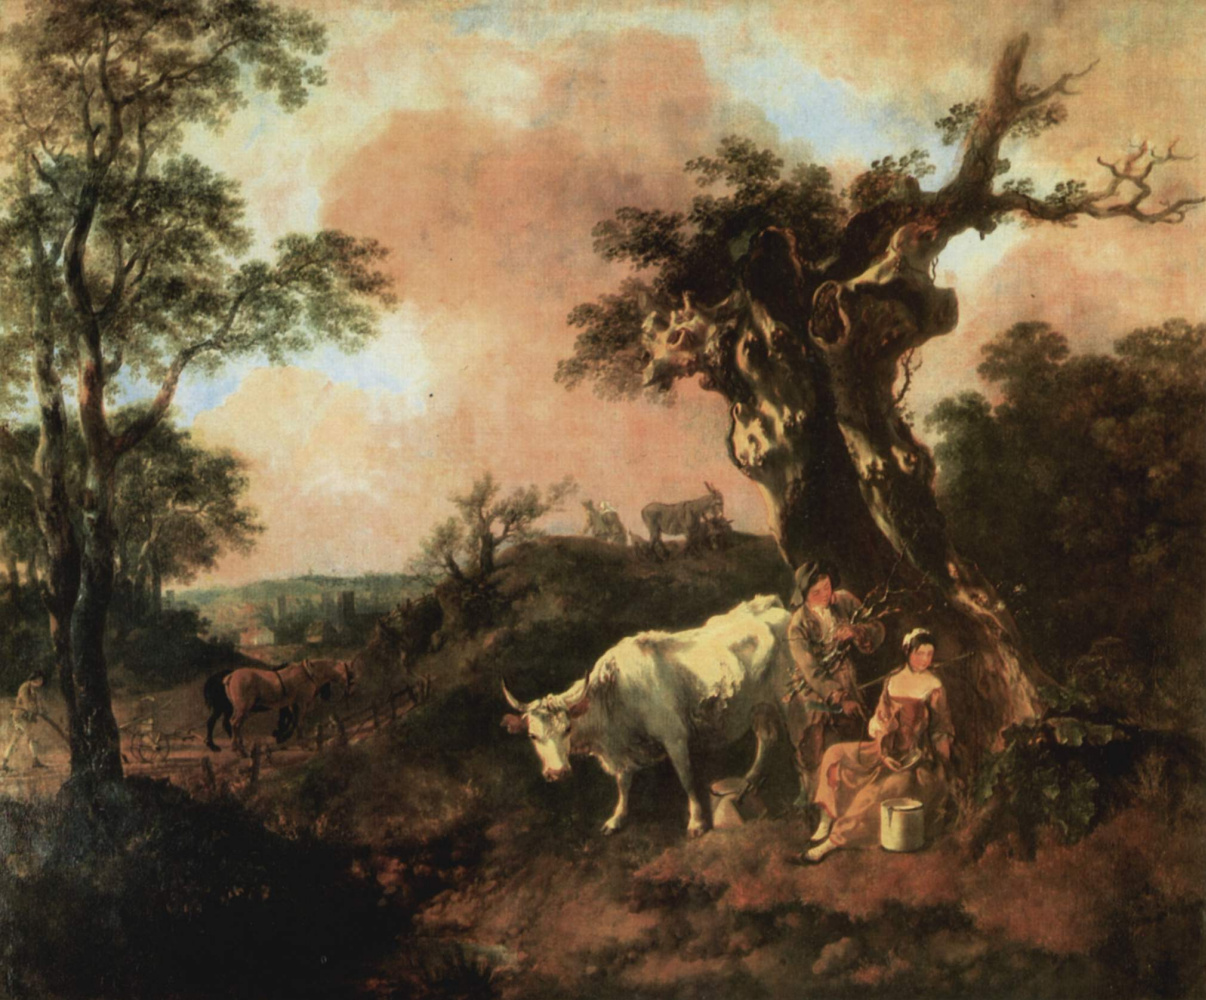 Thomas Gainsborough. Lumberjack, flirting with a young thrush